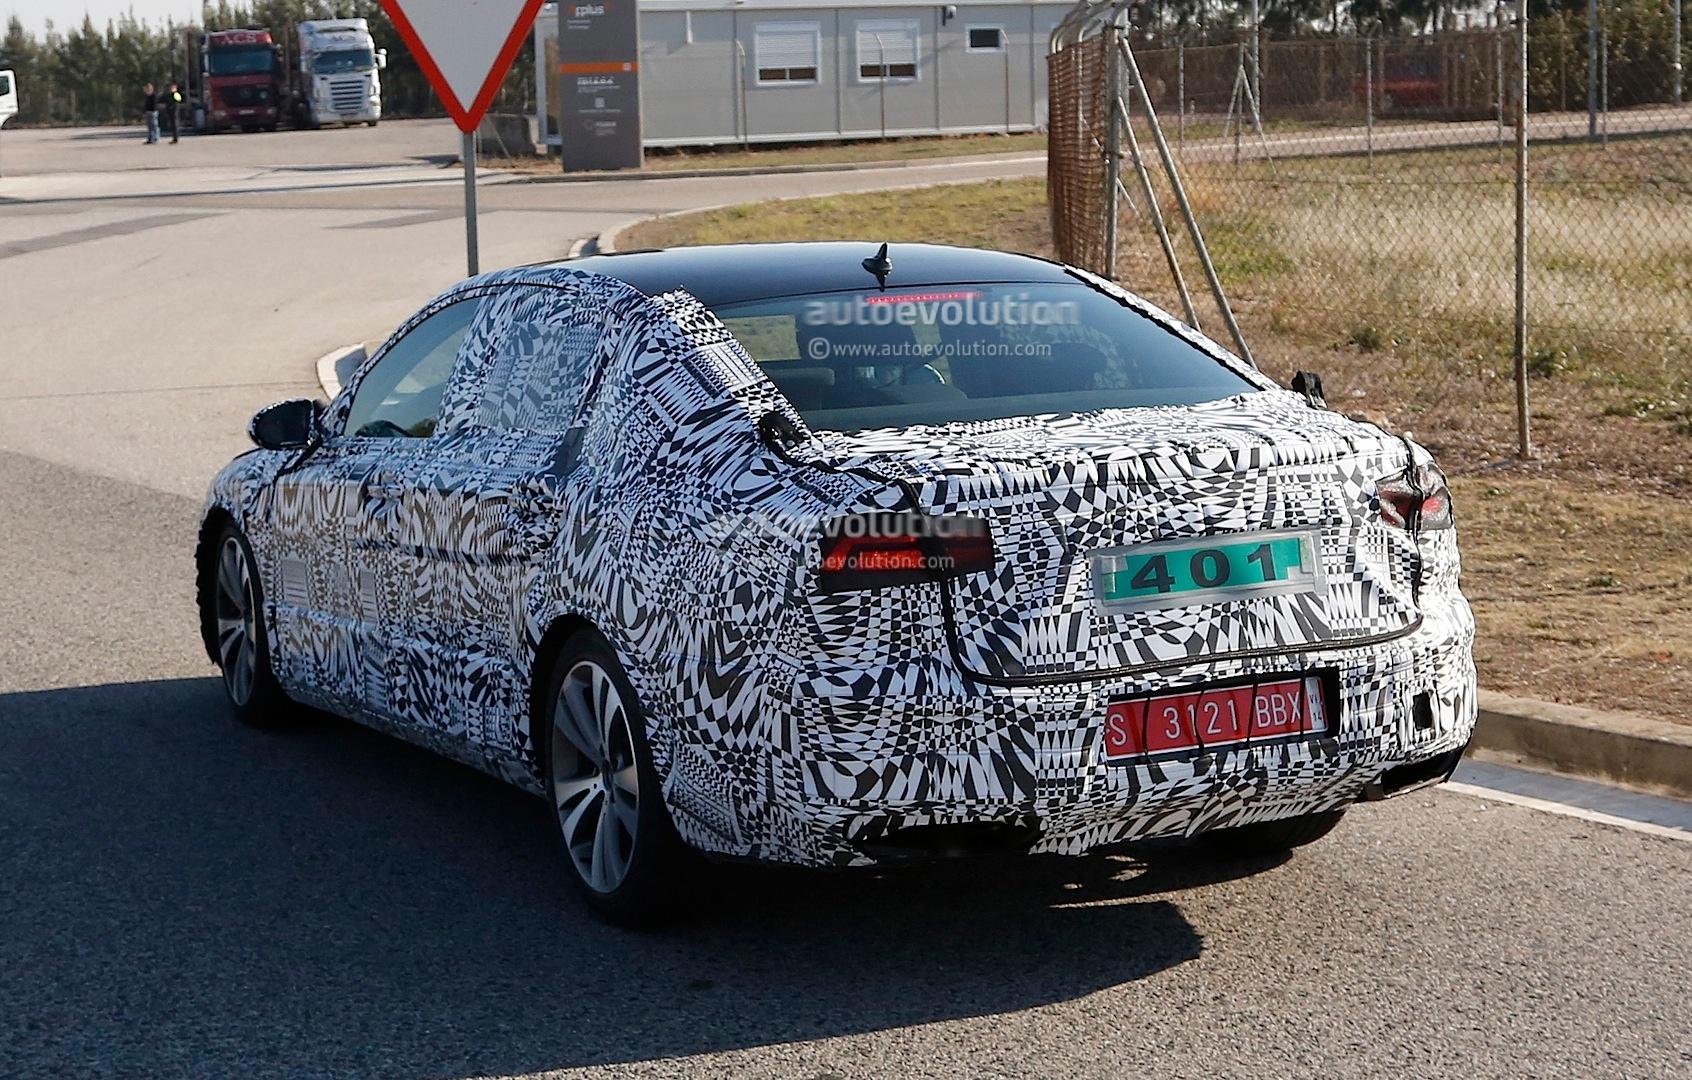 2015 - [Volkswagen] Passat VIII [B8] - Page 7 Spyshots-next-generation-volkswagen-passat-shows-new-details-1080p-4